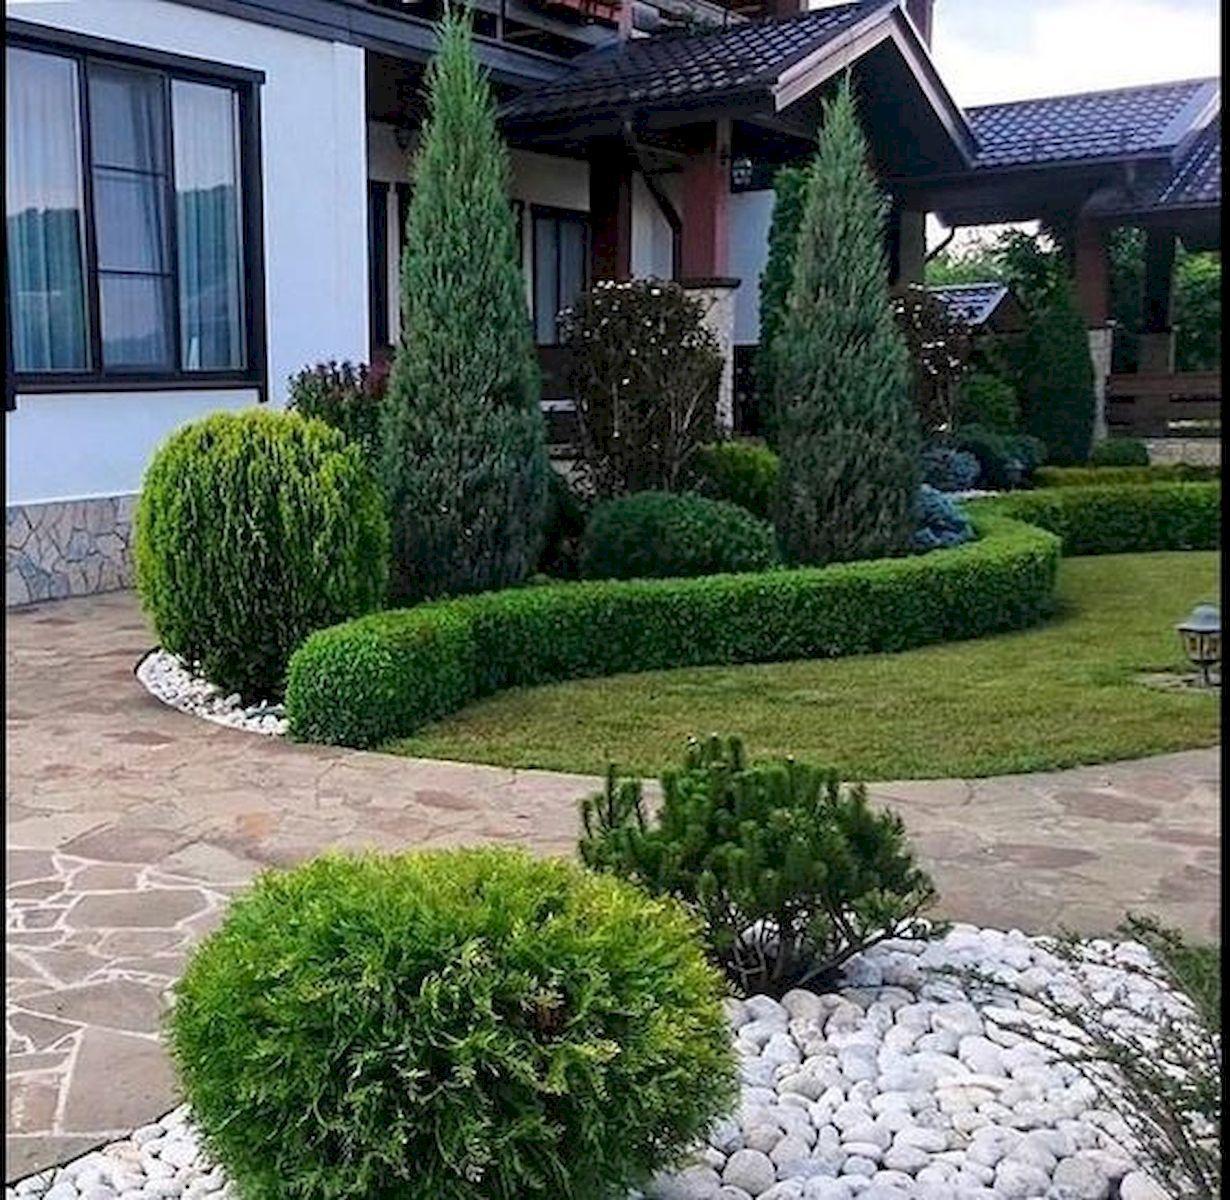 Garden Ideas Designs And Inspiration: 60 Beautiful Front Yards And Backyard Evergreen Garden